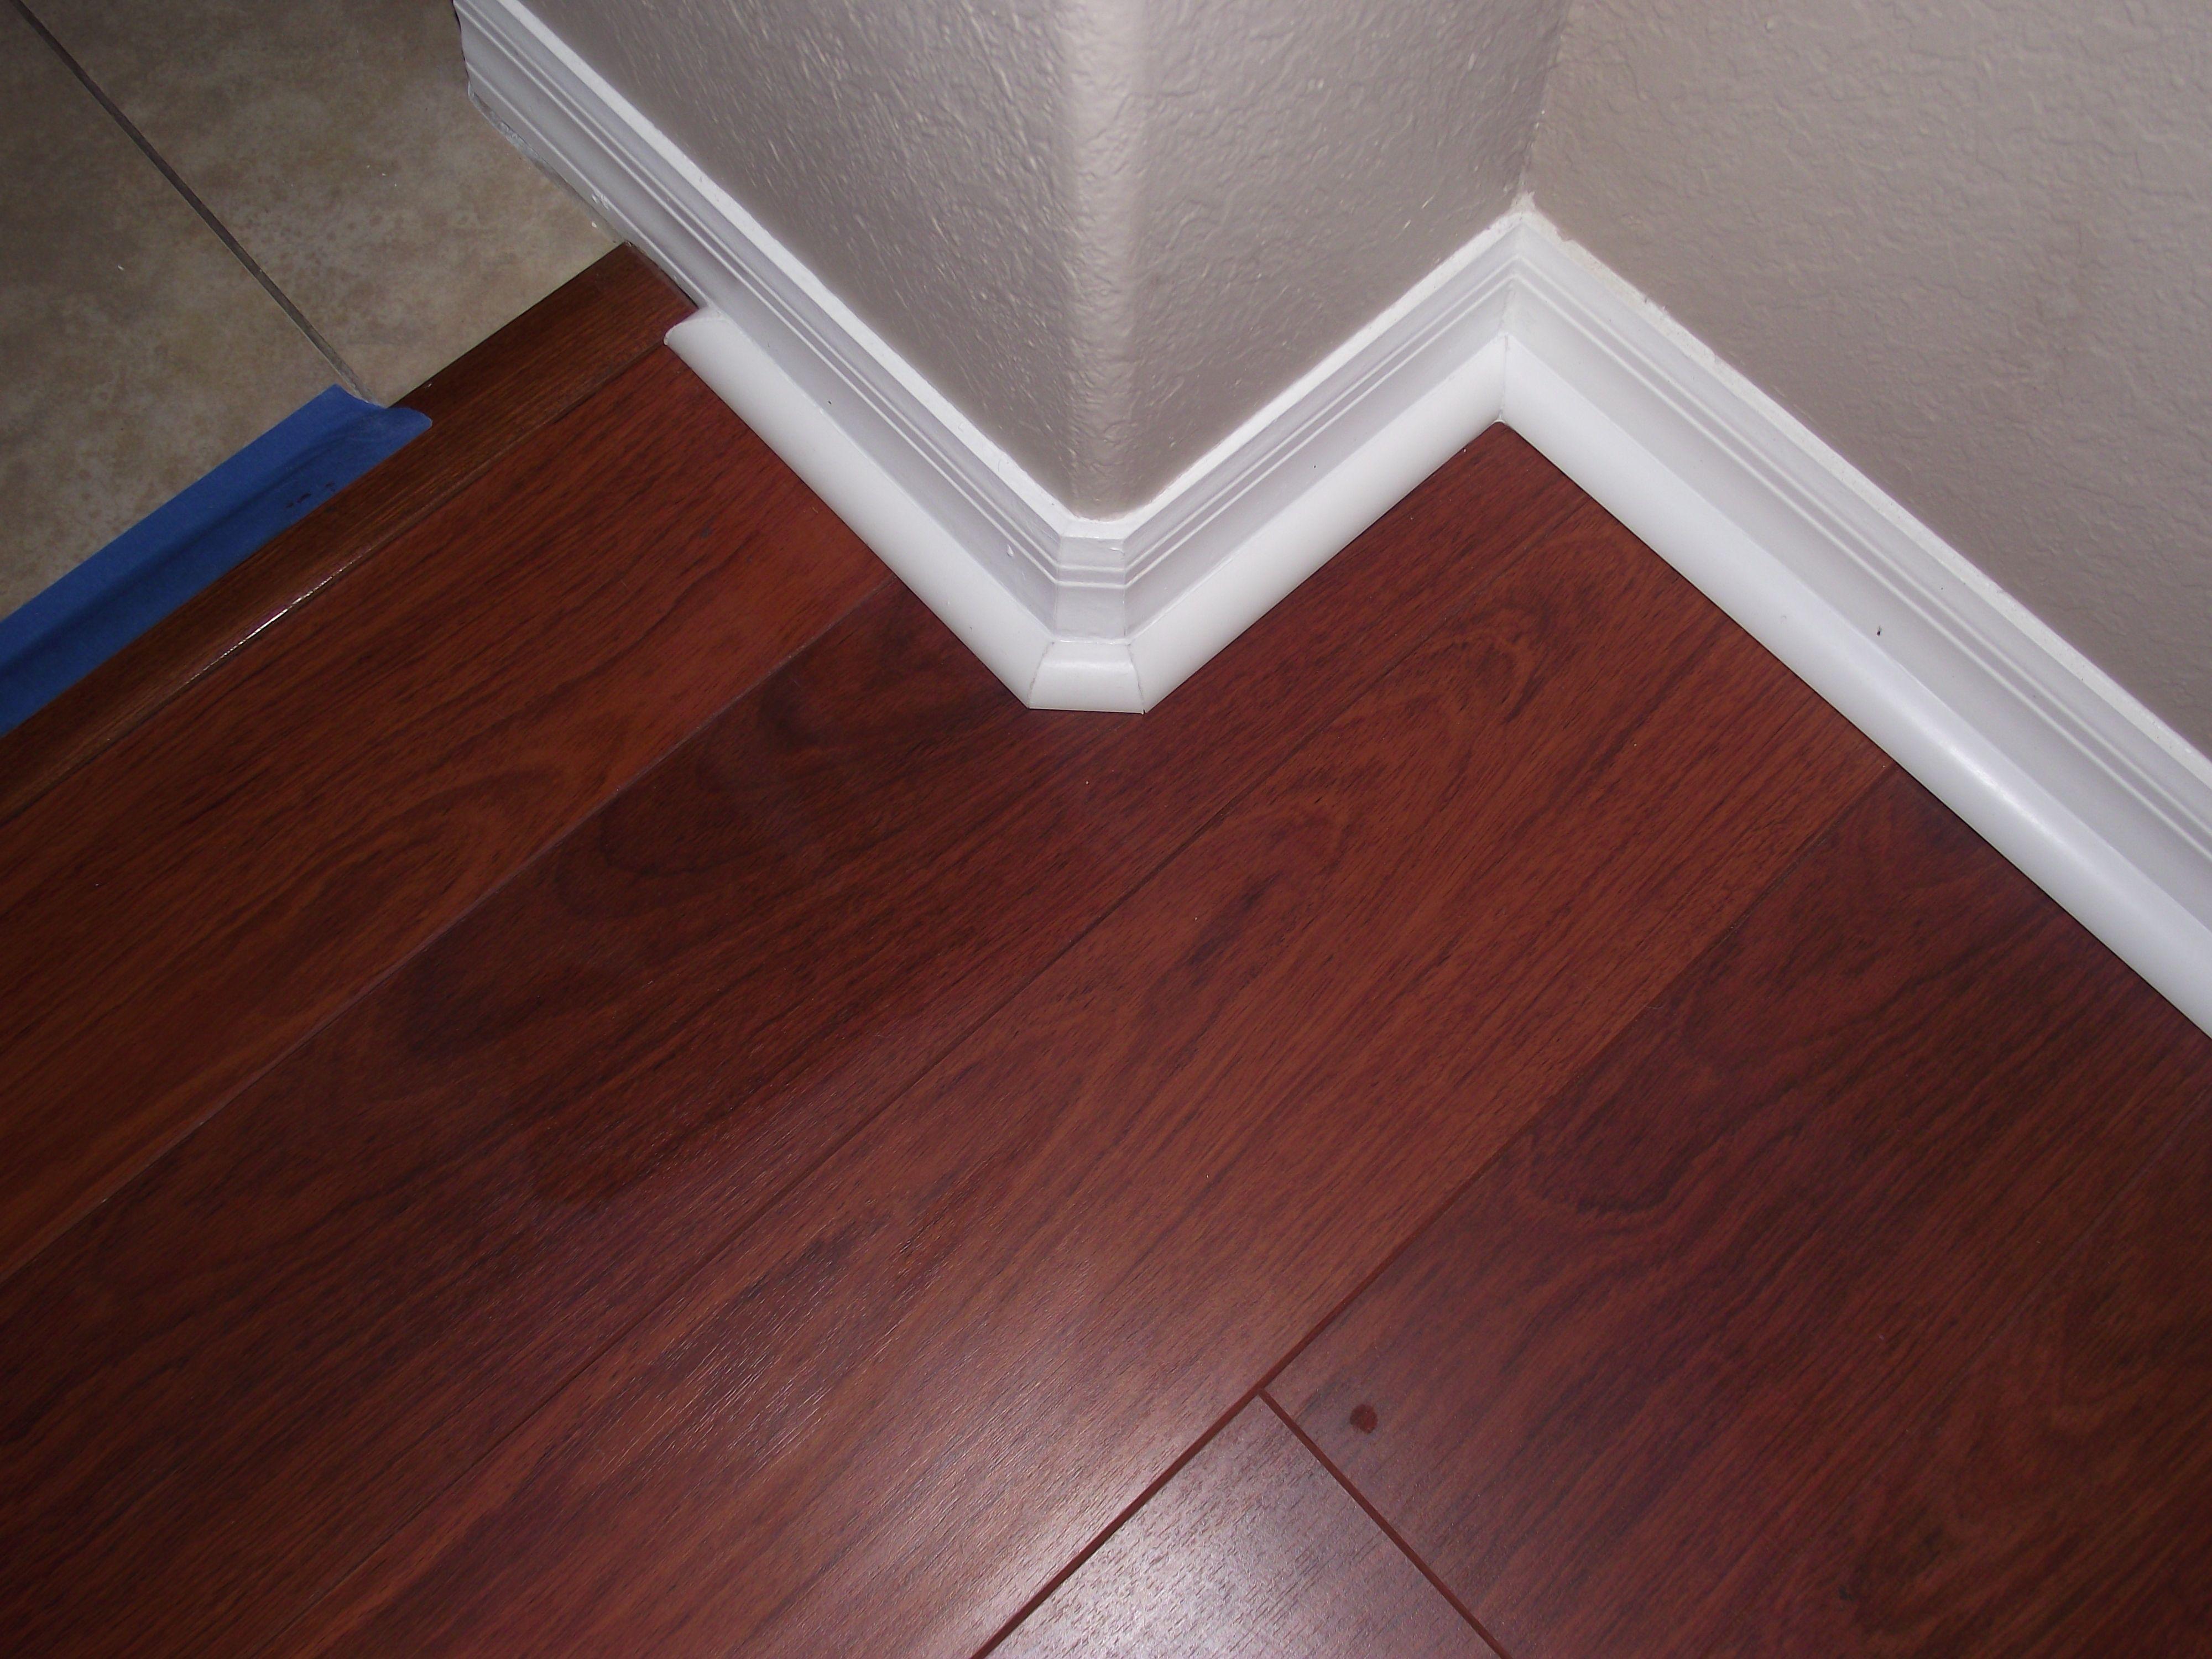 Installing Quarter Round Moldings Flooring, Installing